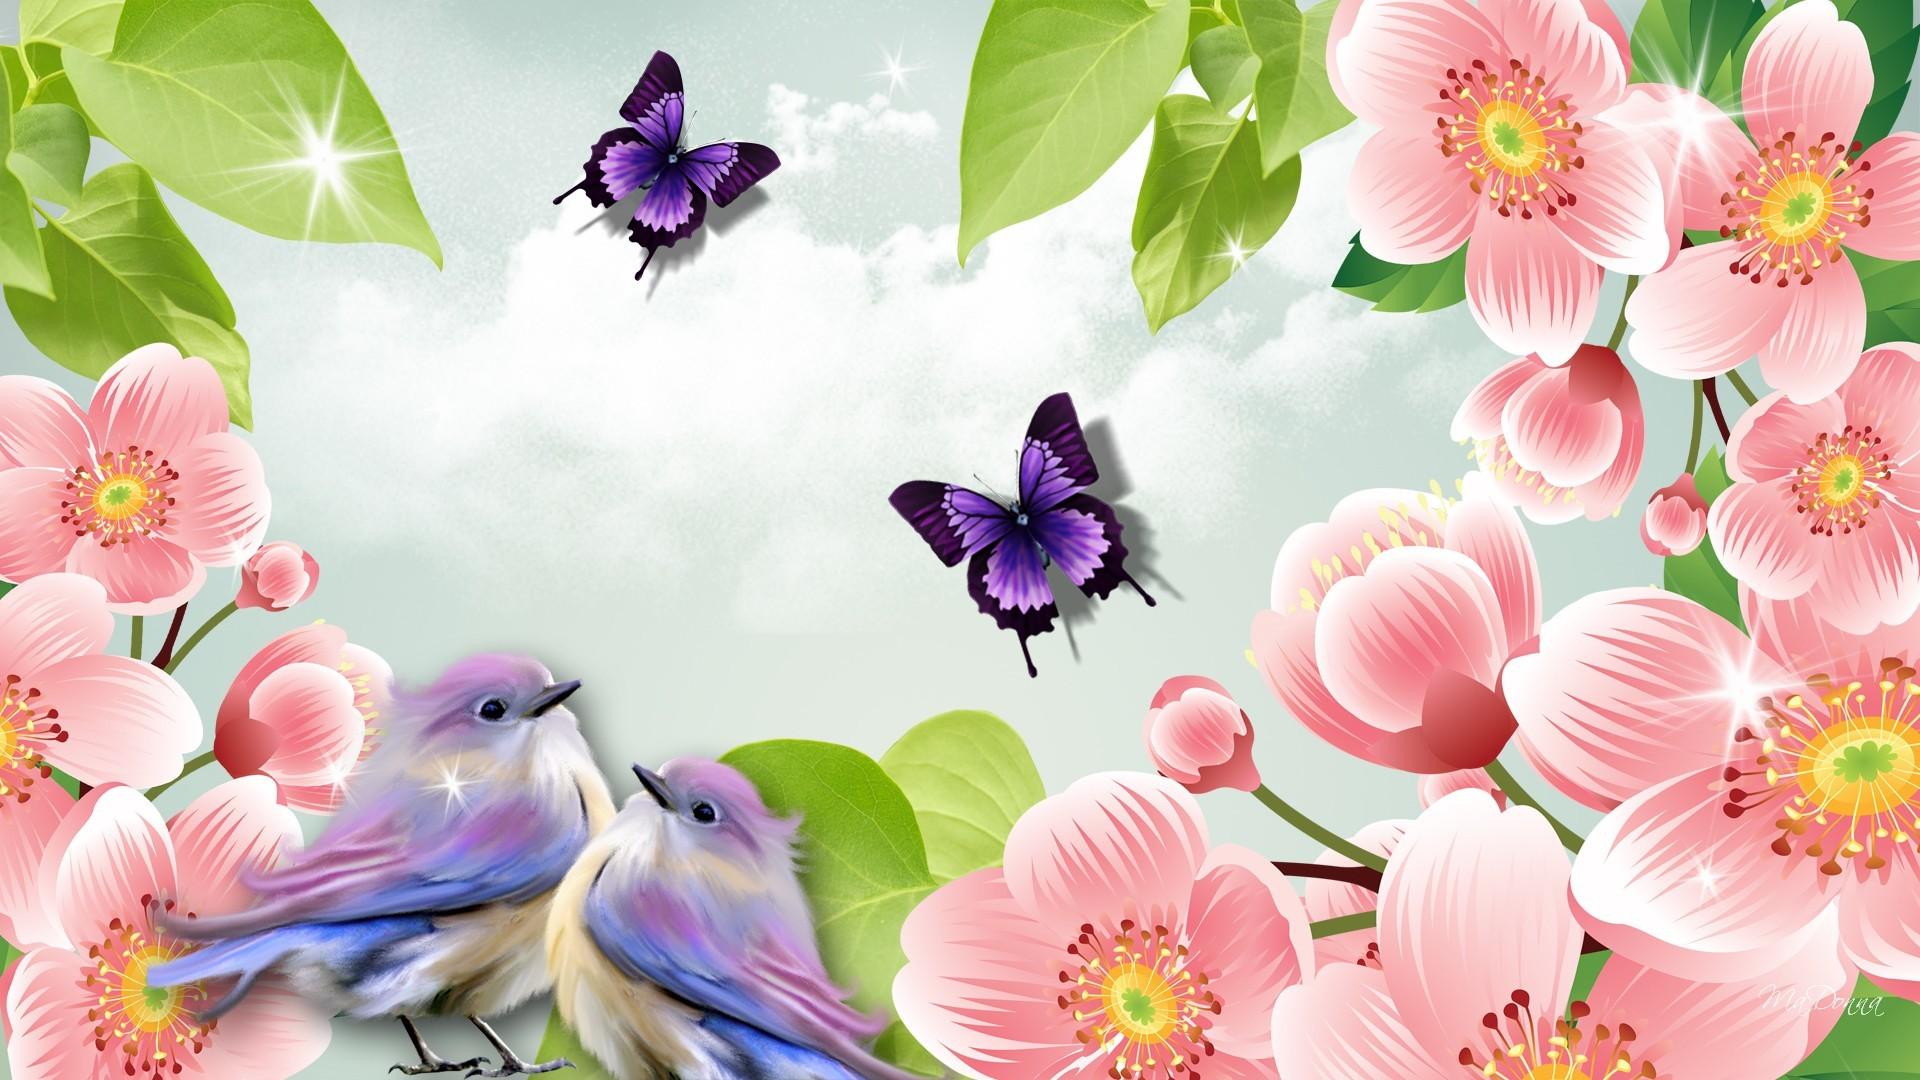 1920x1080 2577 Spring Landscape Nature Wallpaper